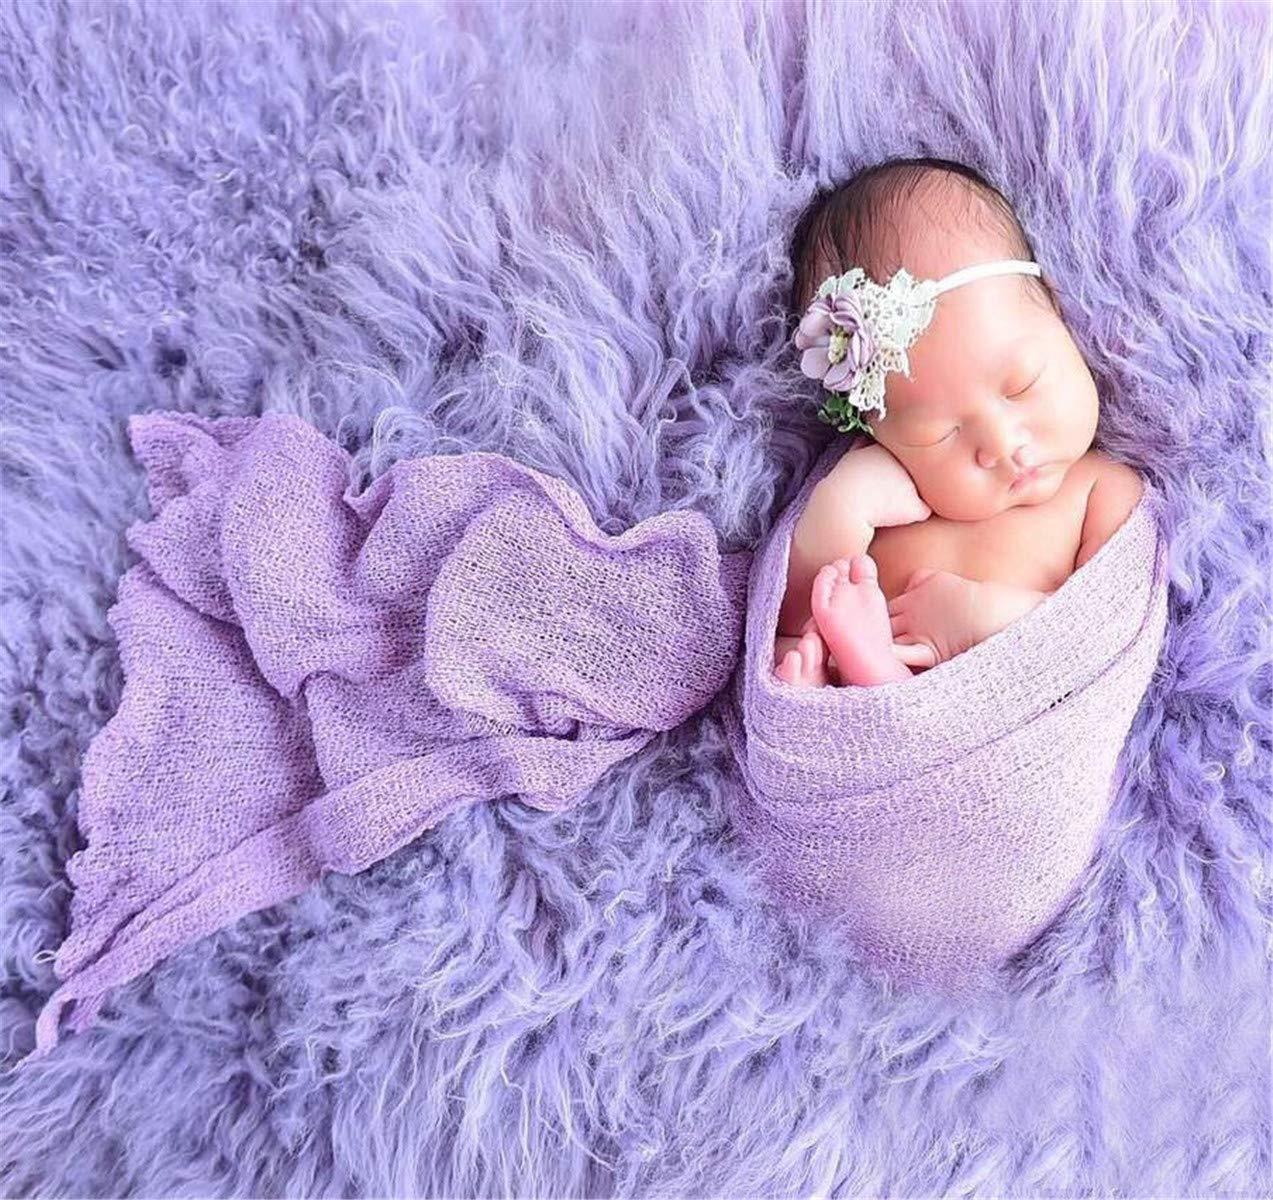 Newborn Baby Stretch Knit Wrap,Photography Photo Props Rainbow Tassel Blanket(Include Headband Photography Photo Props Rainbow Tassel Blanket/(Include Headband Tee-Mo